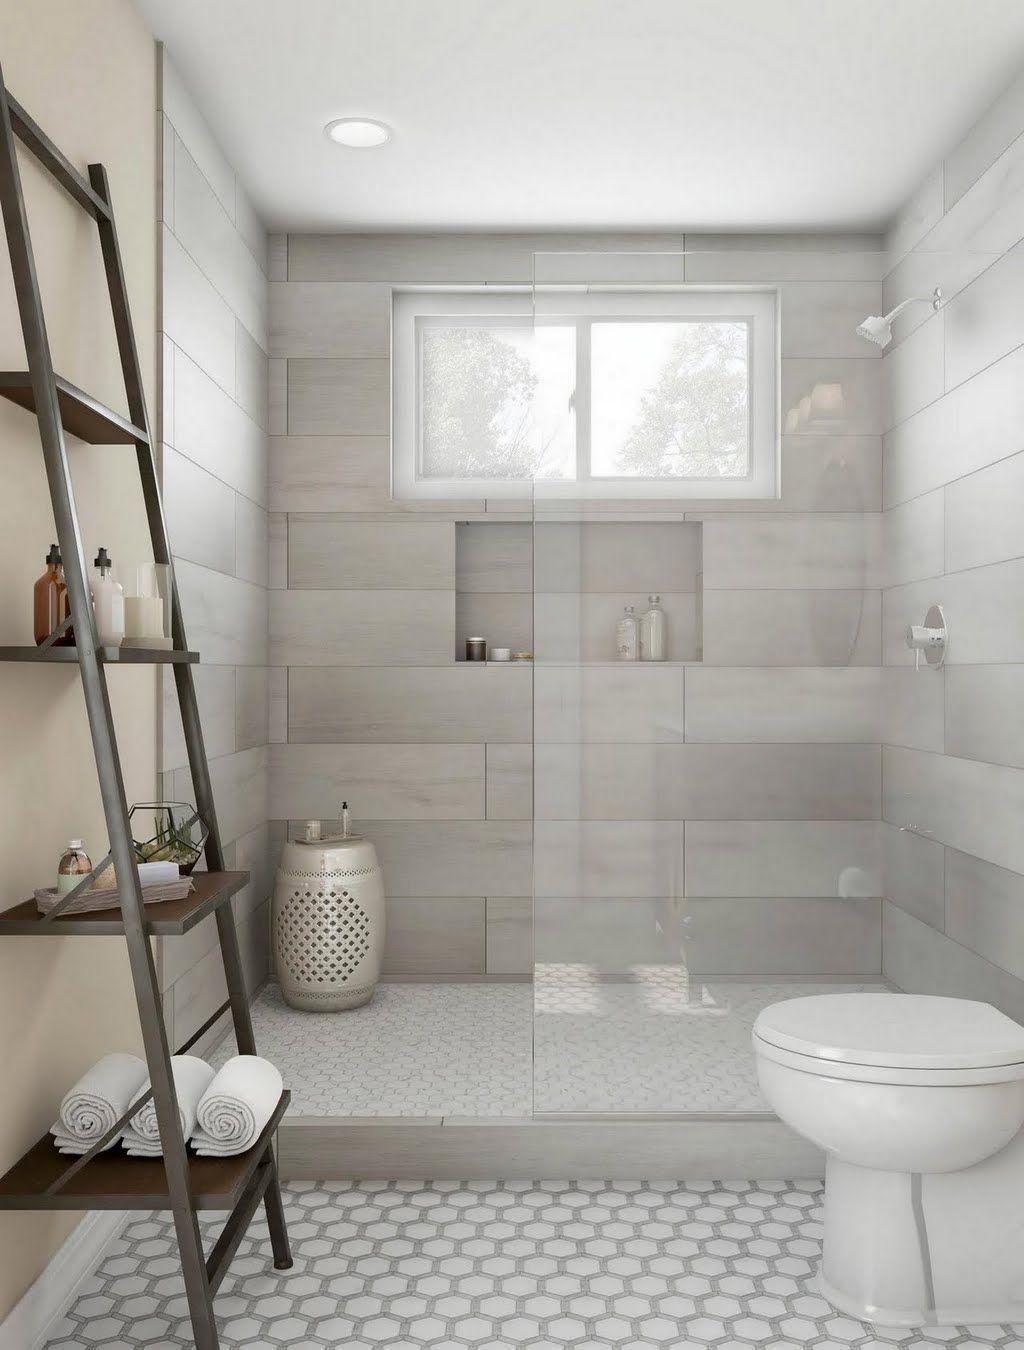 Astonishing Farmhouse Shower Tile Decor Ideas To Try 48